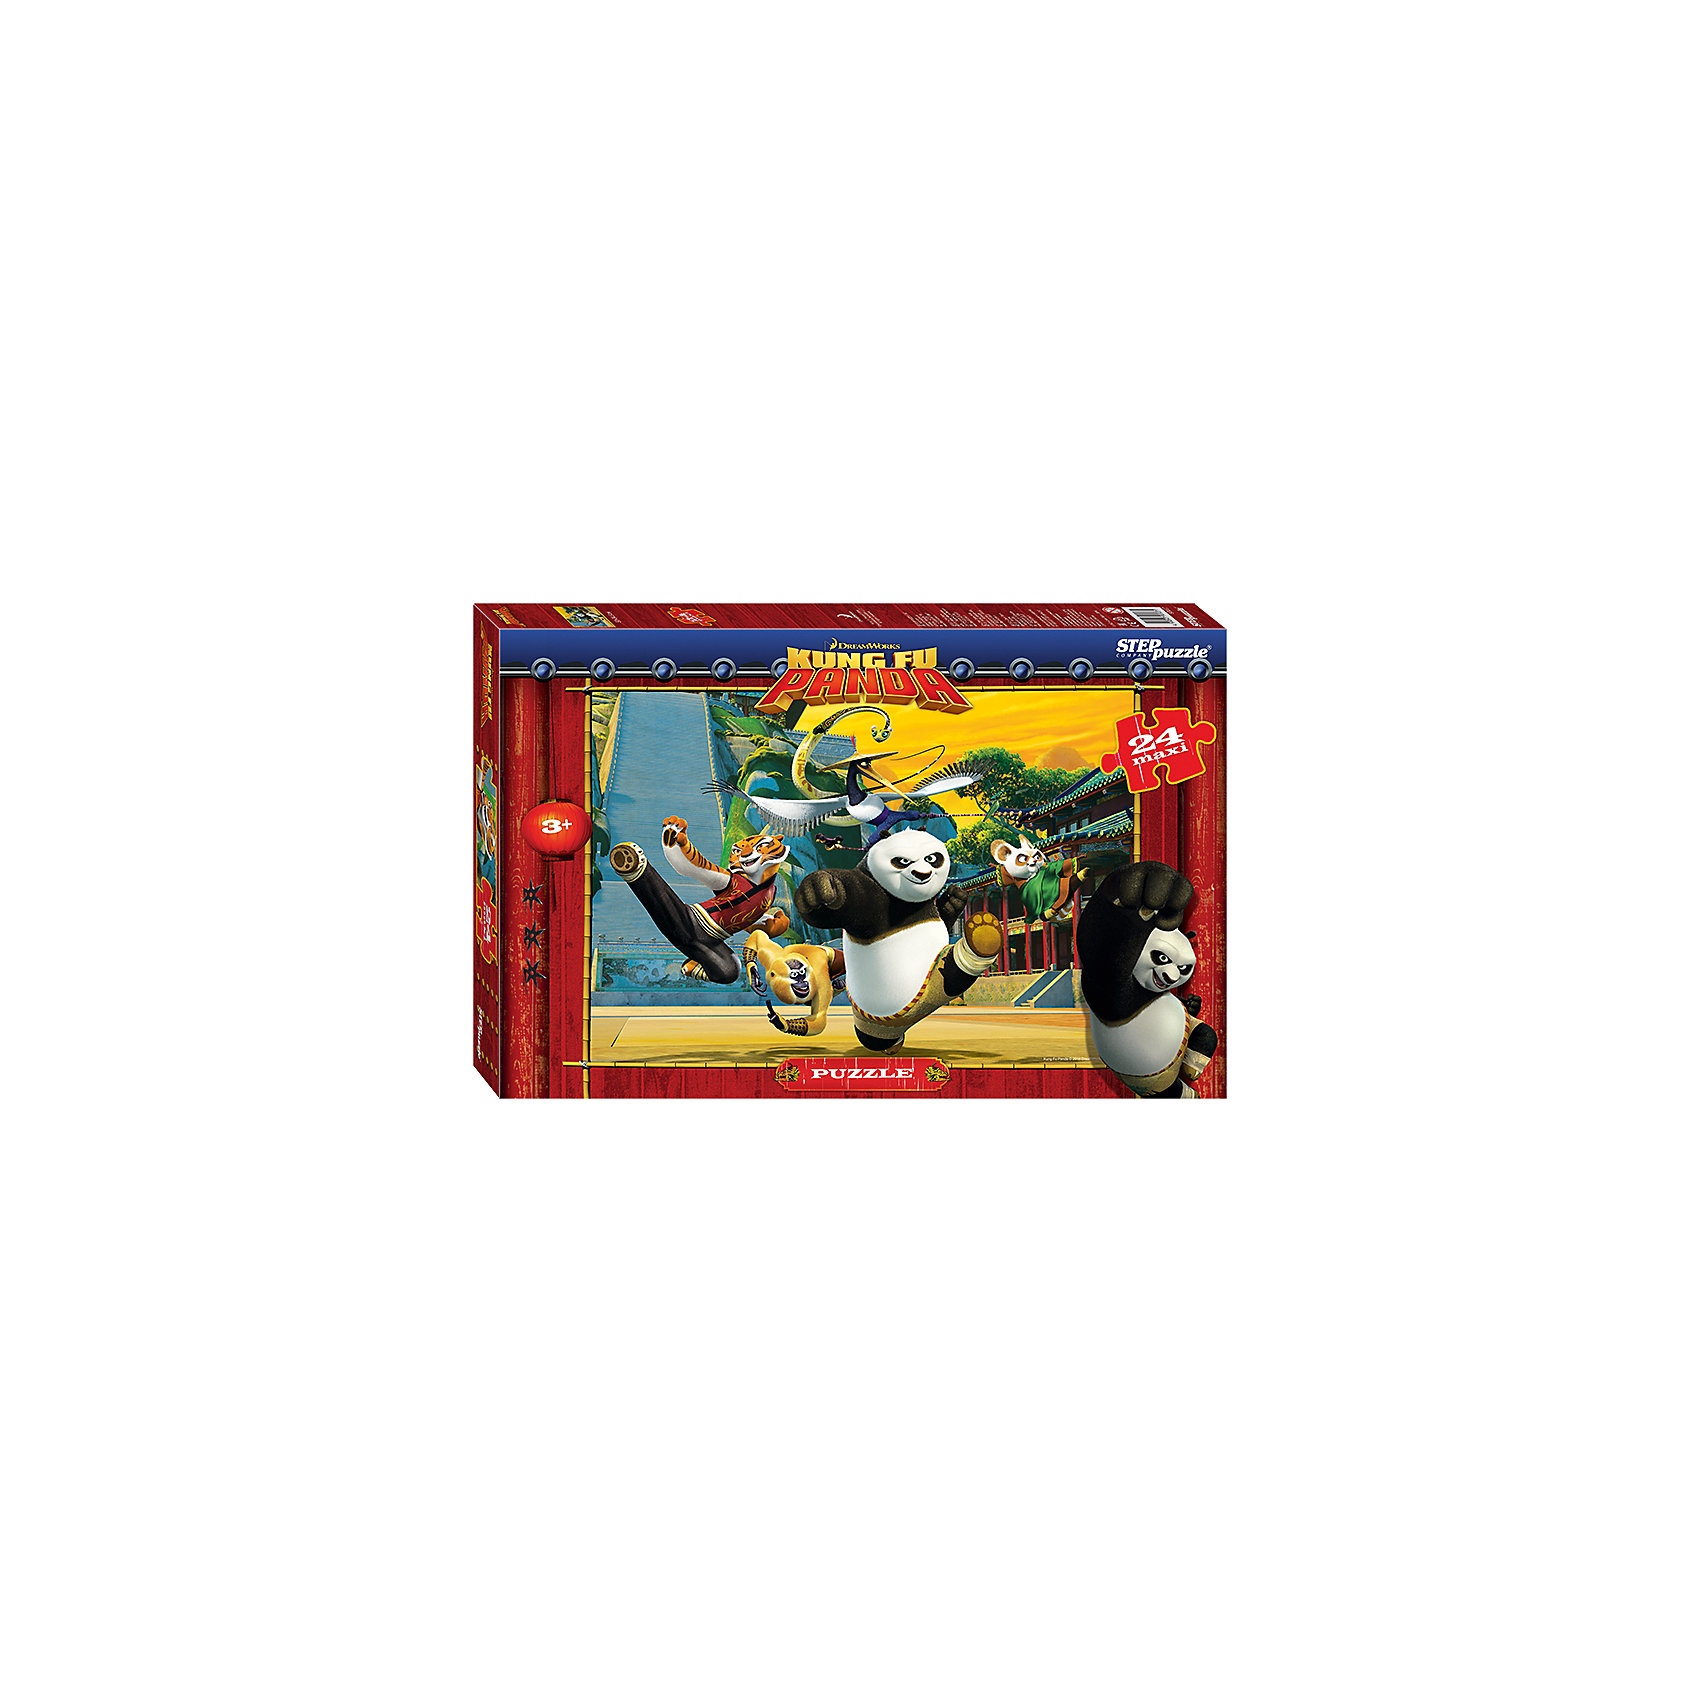 Степ Пазл Пазл Кунг-фу Панда, 24 MAXI детали, Step Puzzle купить газ 66 кунг в краснодарском крае